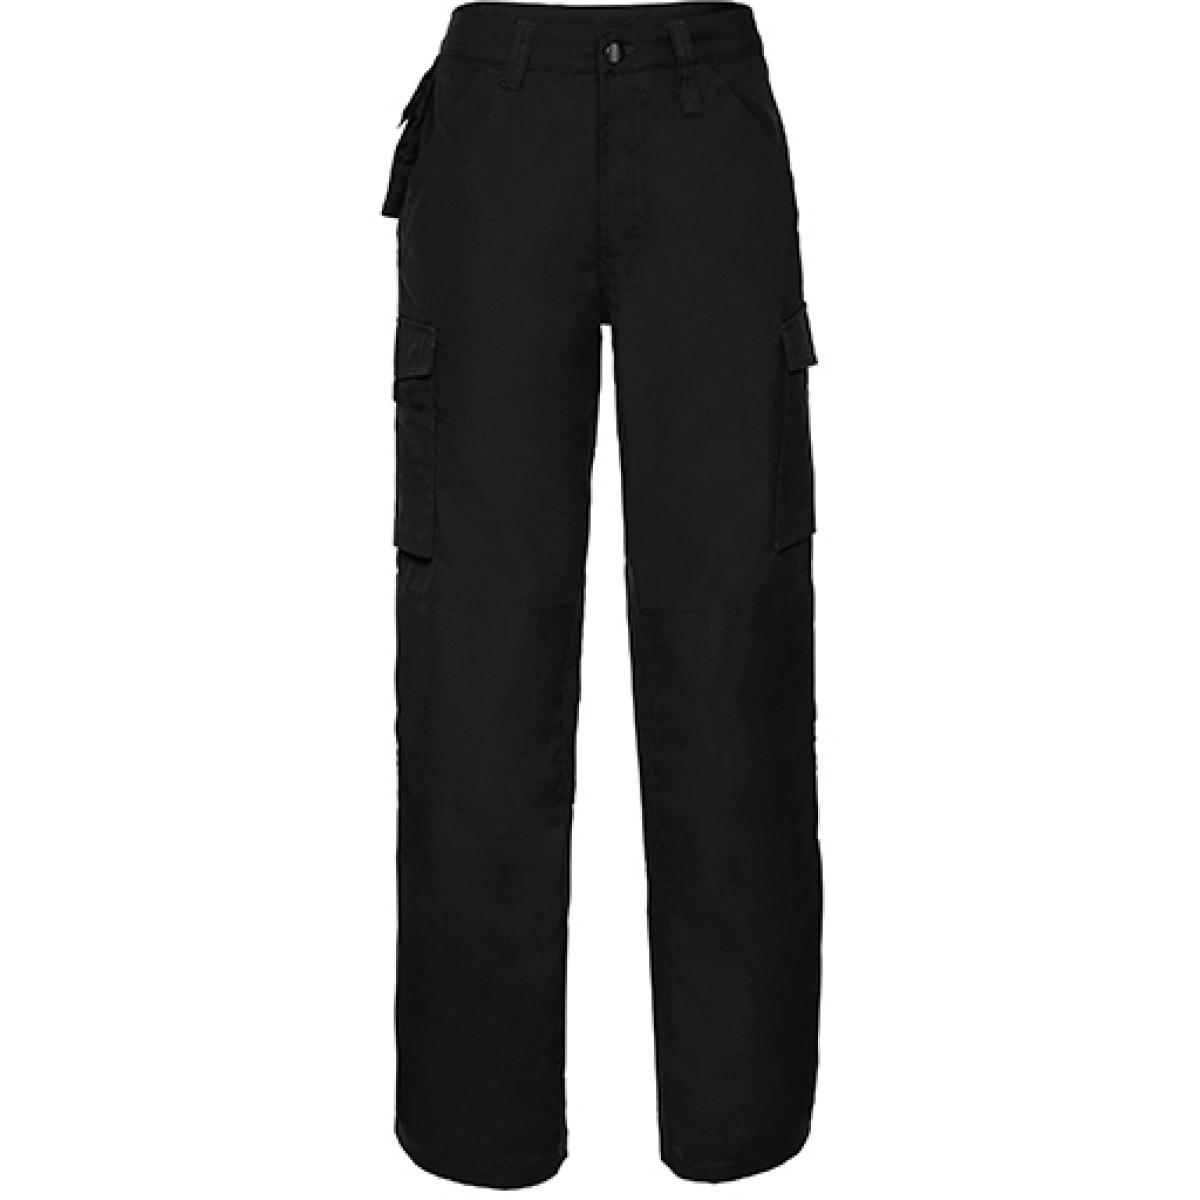 Russell R 015M 0 | Strapazierfähige Workwear Arbeitshose Trocknergeeignet